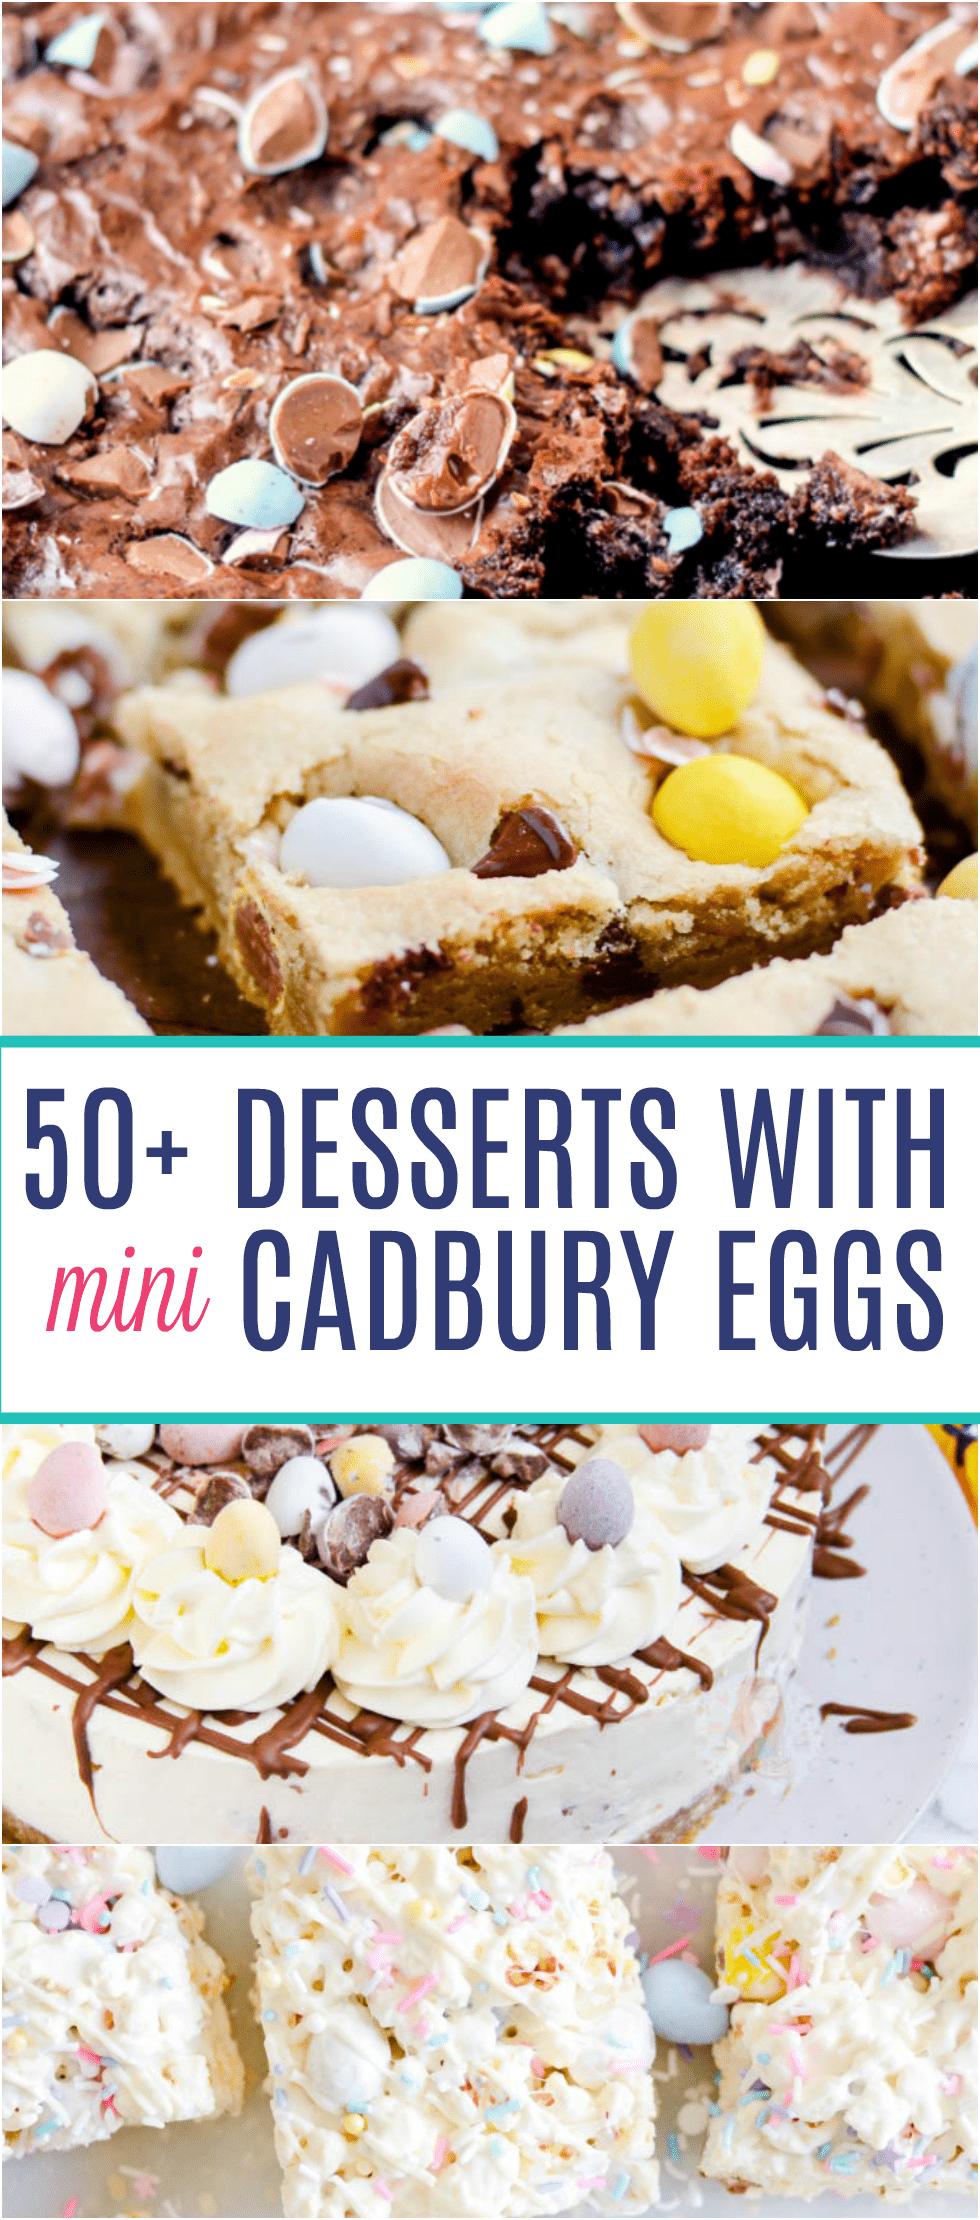 50+ Desserts with Cadbury Eggs